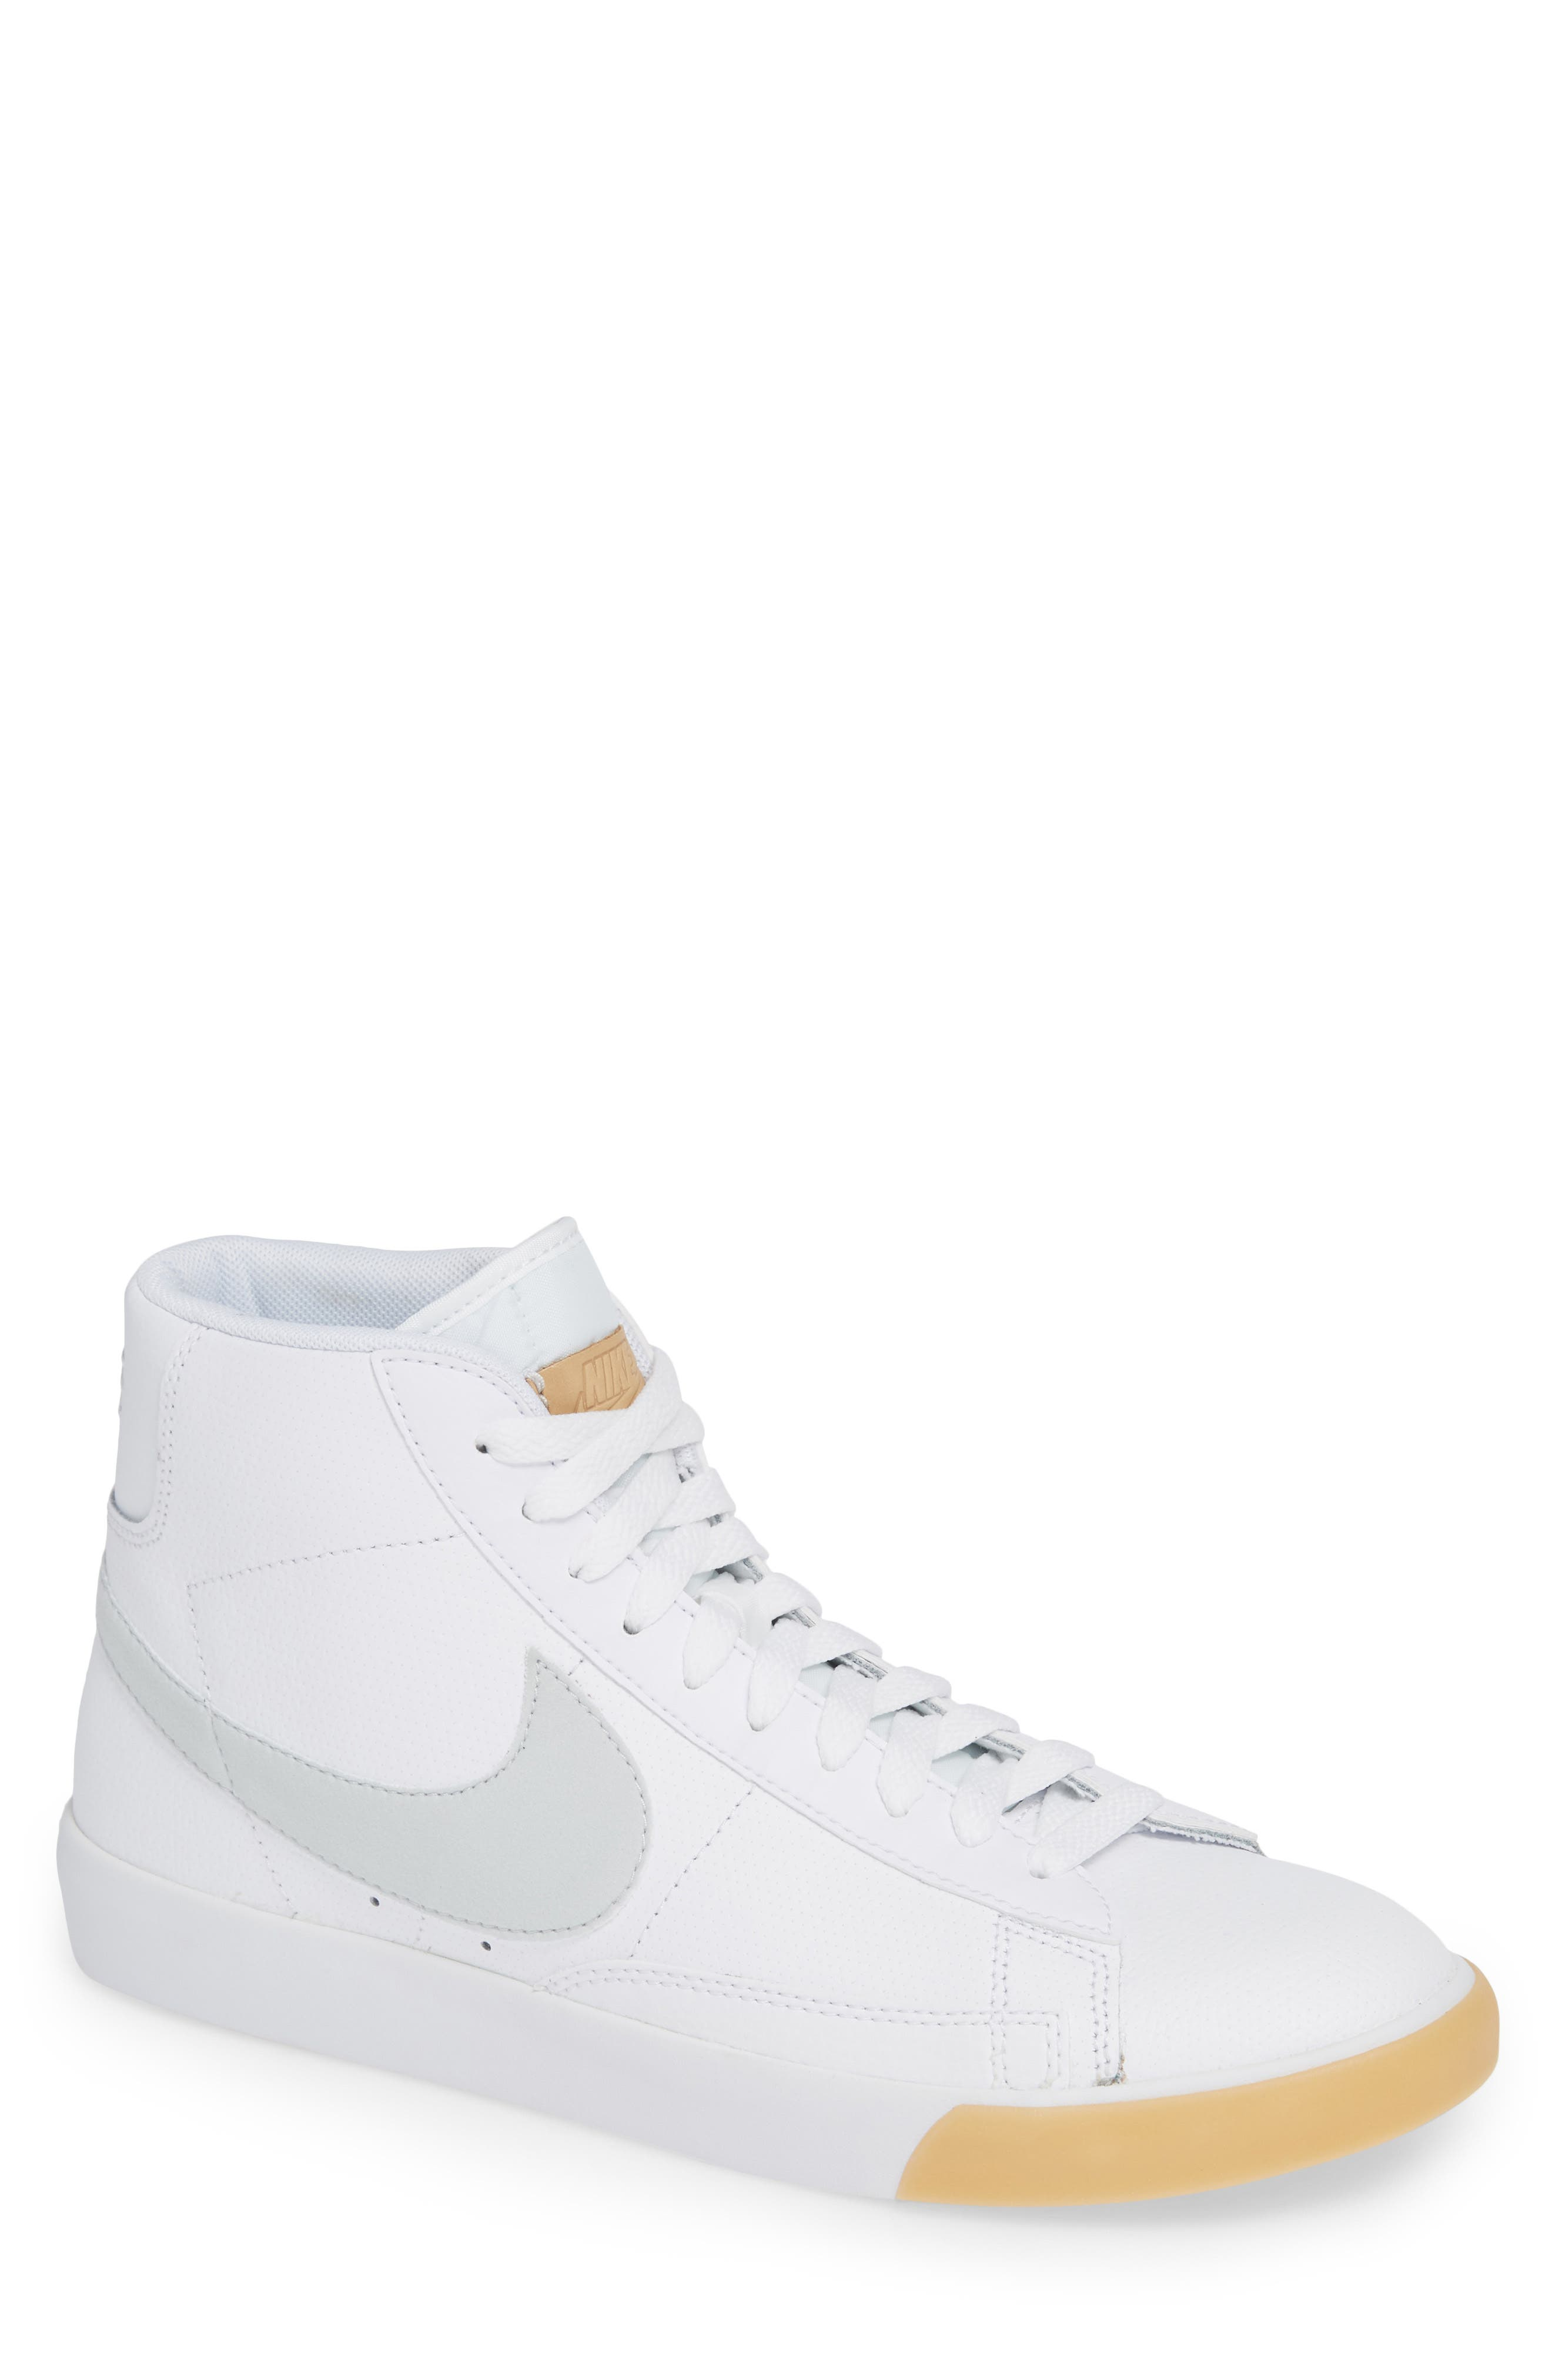 Blazer Mid Sneaker,                             Main thumbnail 1, color,